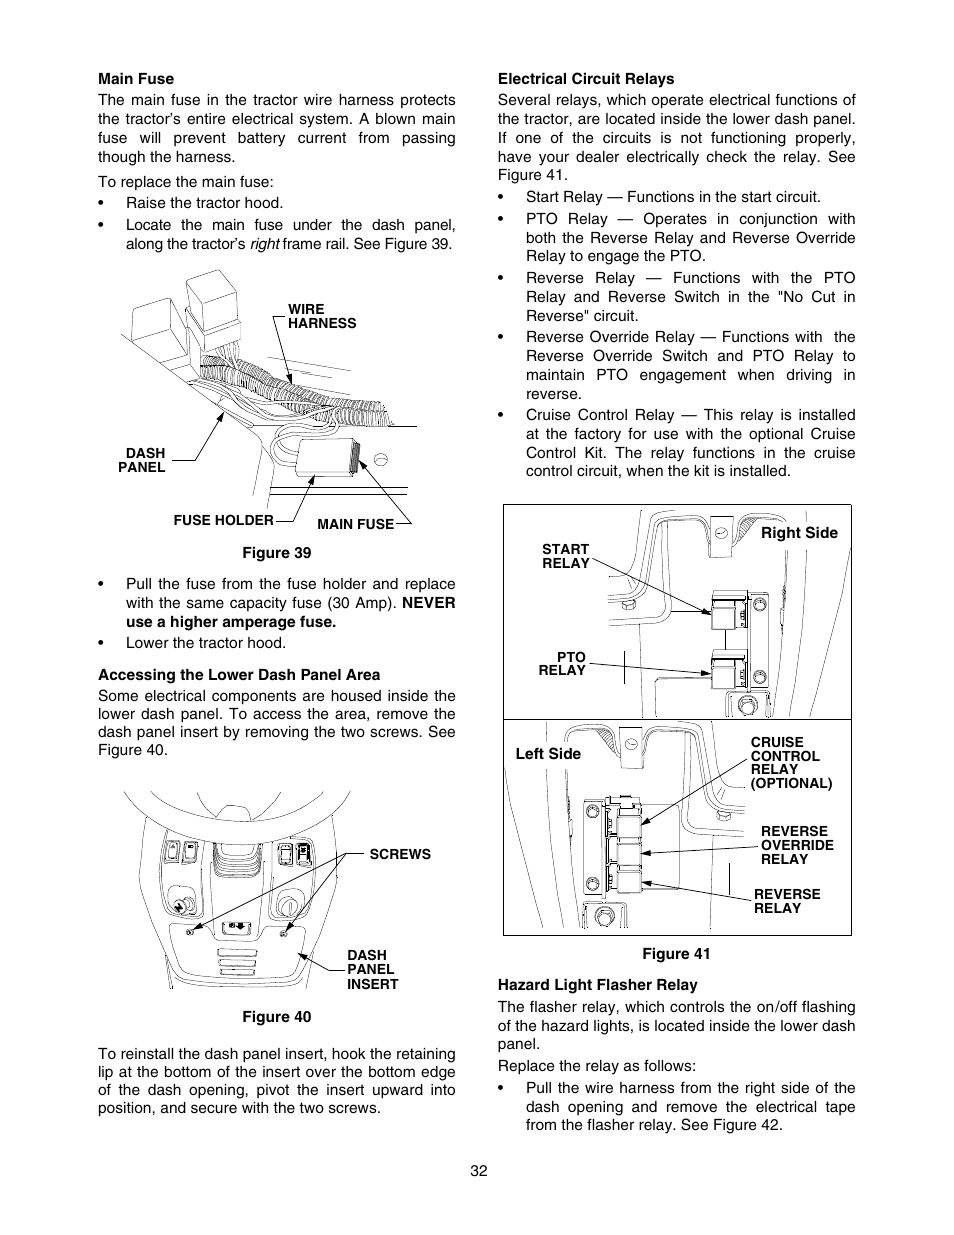 Cub Cadet 5252 User Manual | Page 32 / 48